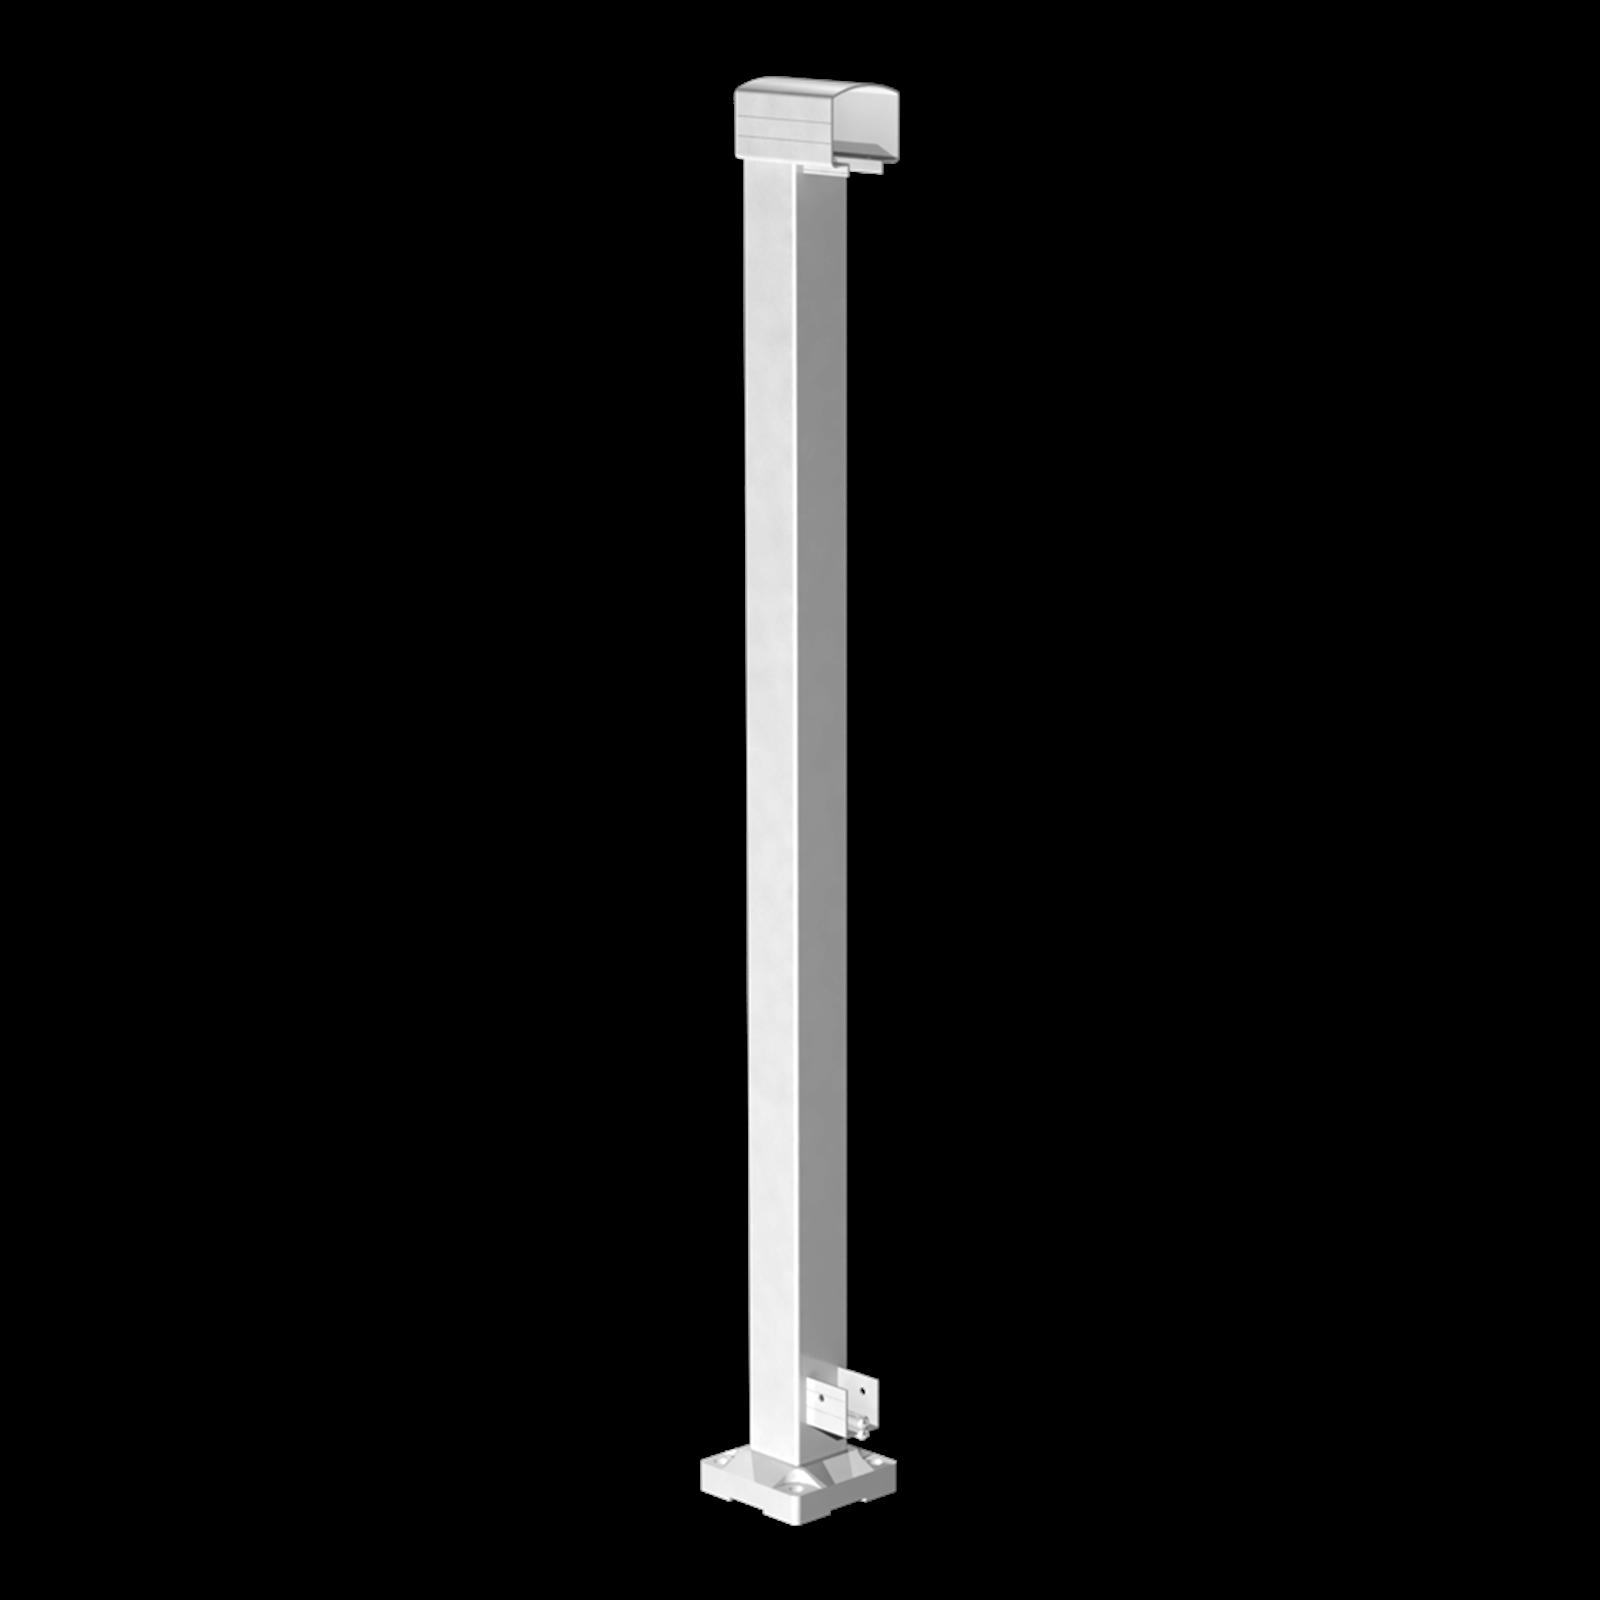 Peak 1000mm Aluminium Balustrade End Post